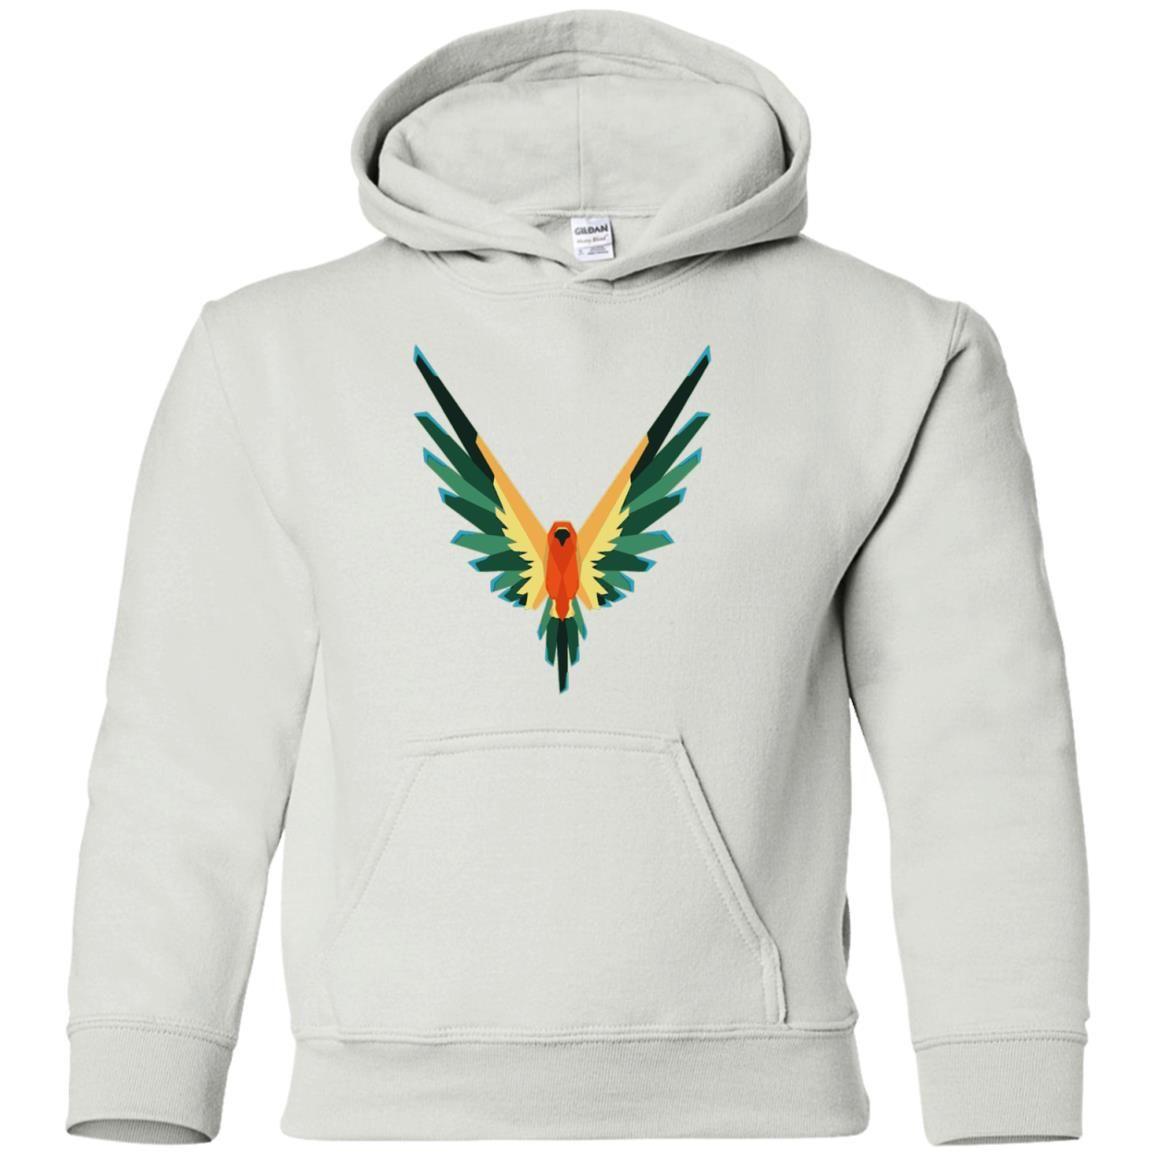 image 1233 - Logan Paul Maverick kid shirt & sweatshirt